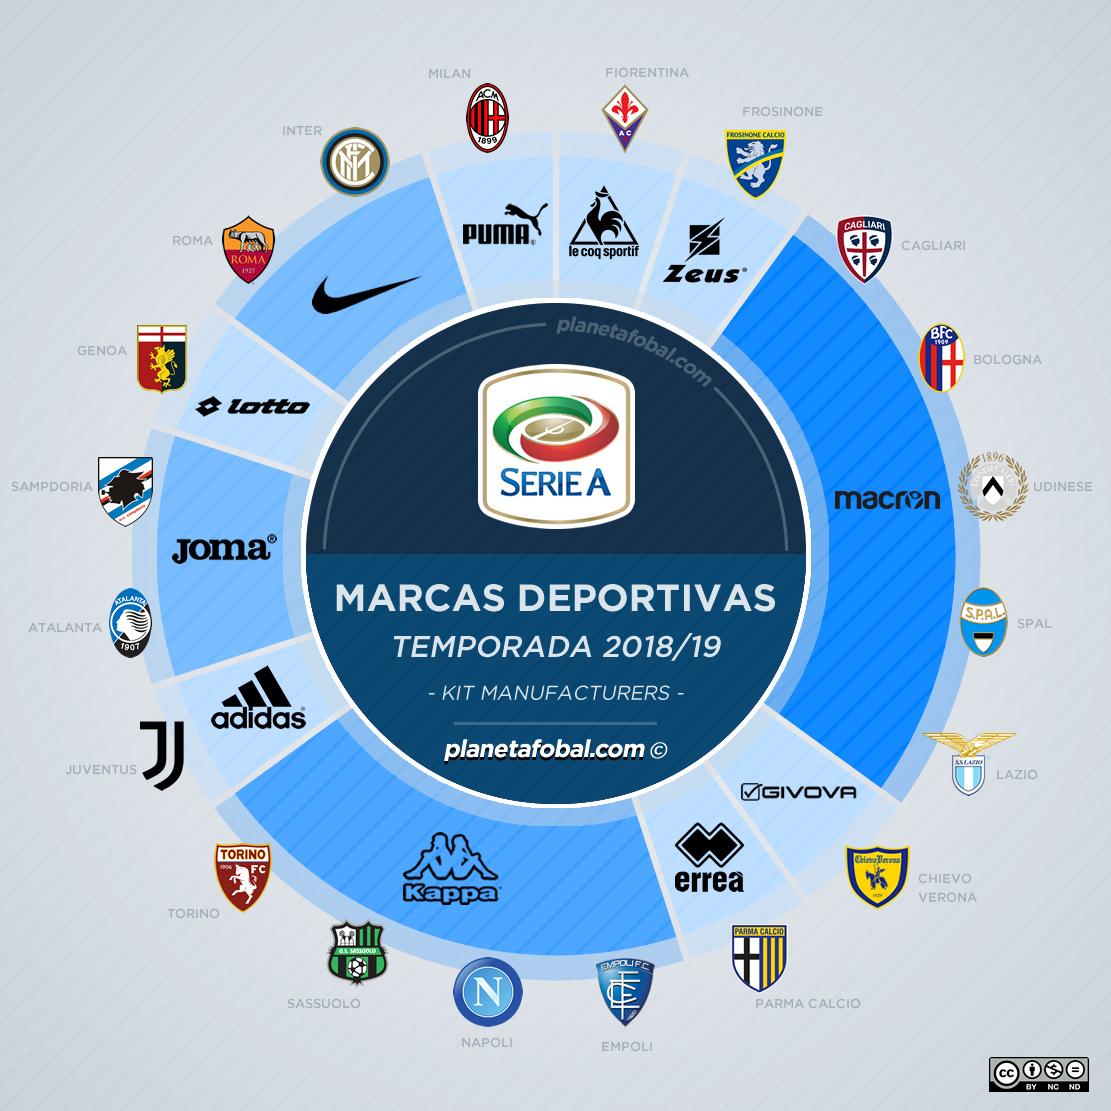 As fabricantes esportivas no Campeonato Italiano 2018 19 - Show de ... 7617642151235